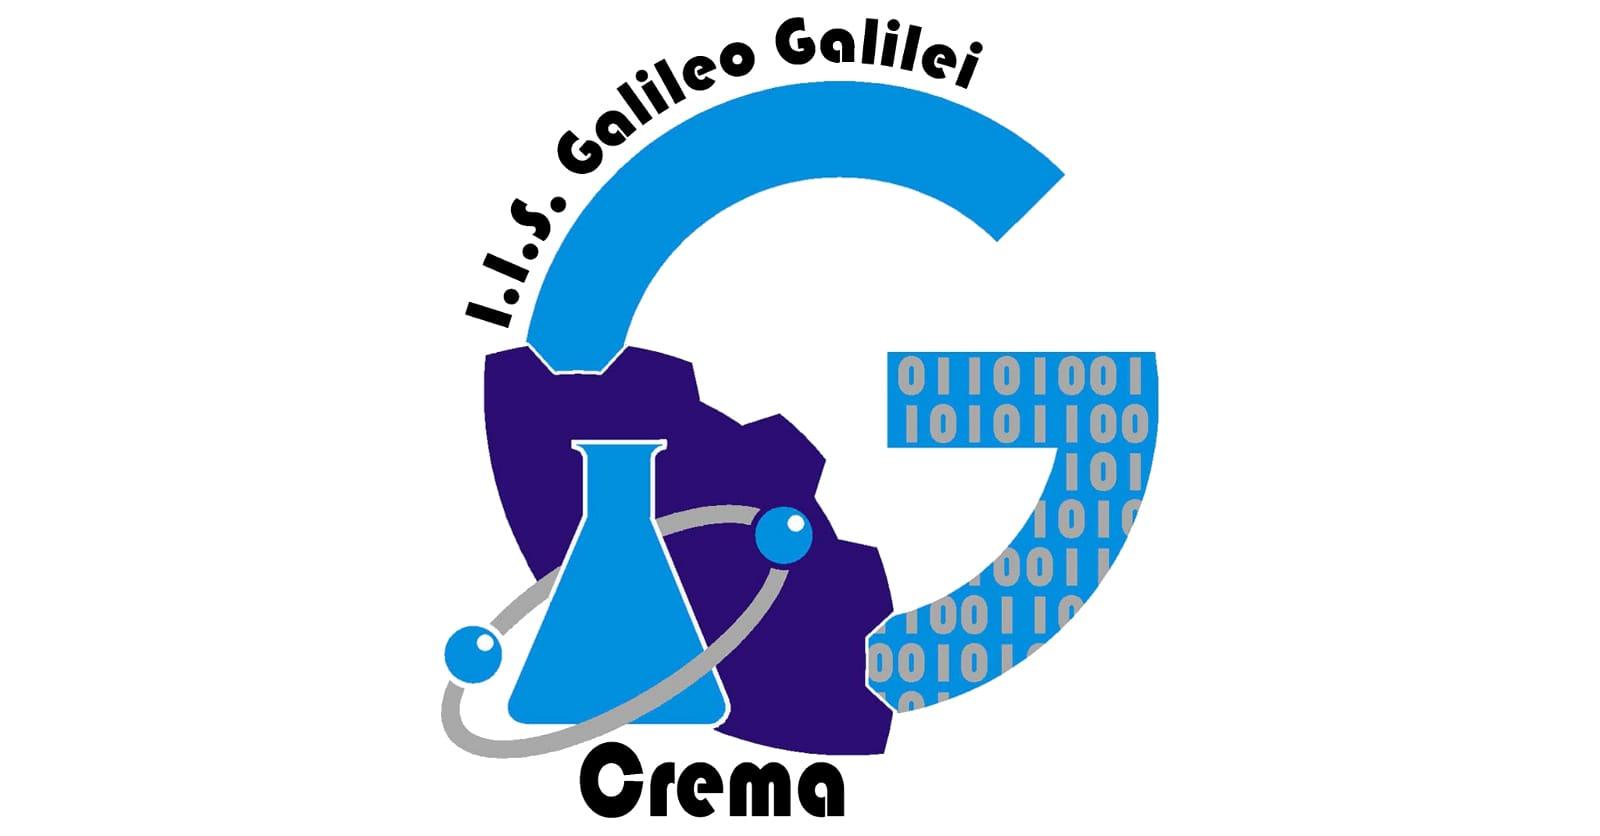 ISS Galileo Galilei